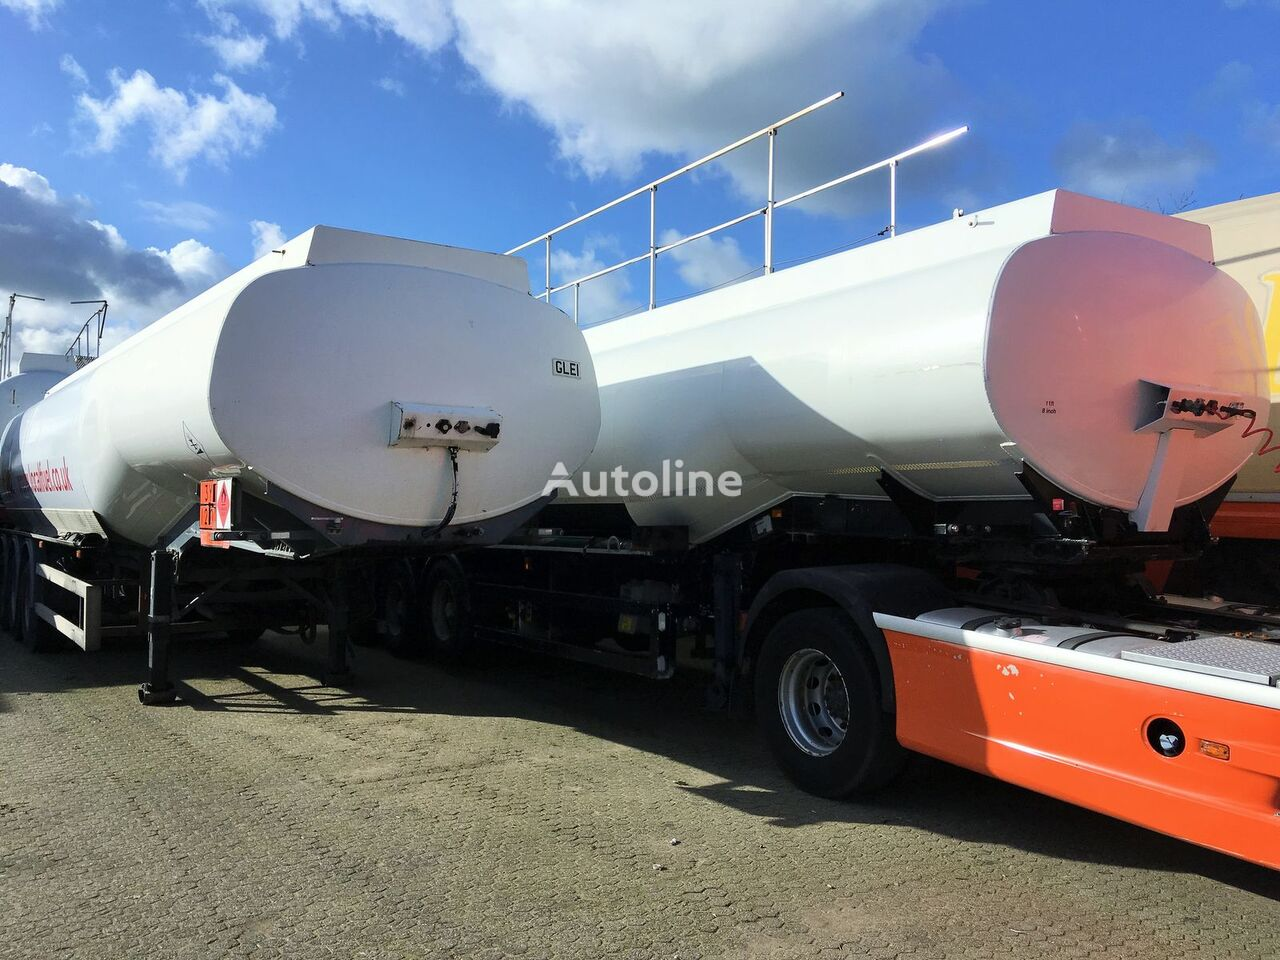 FRUEHAUF Fuel 40.400 ltr Benzin-Diesel LGBF brandstoftank oplegger